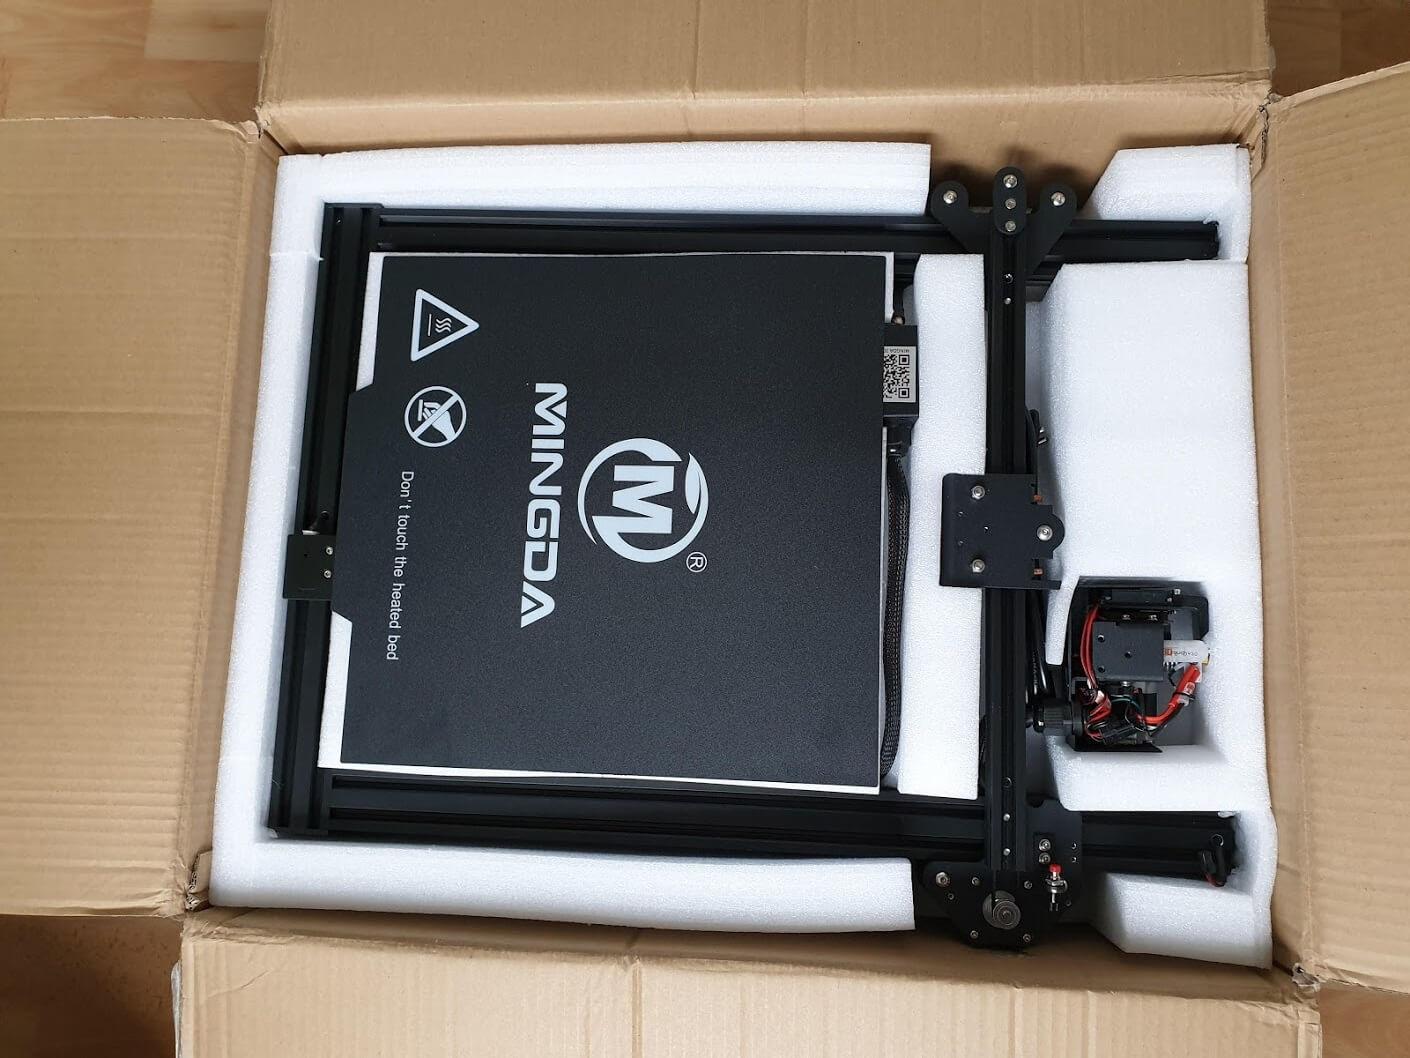 Mingda-D3-Pro-Review-Packaging-4